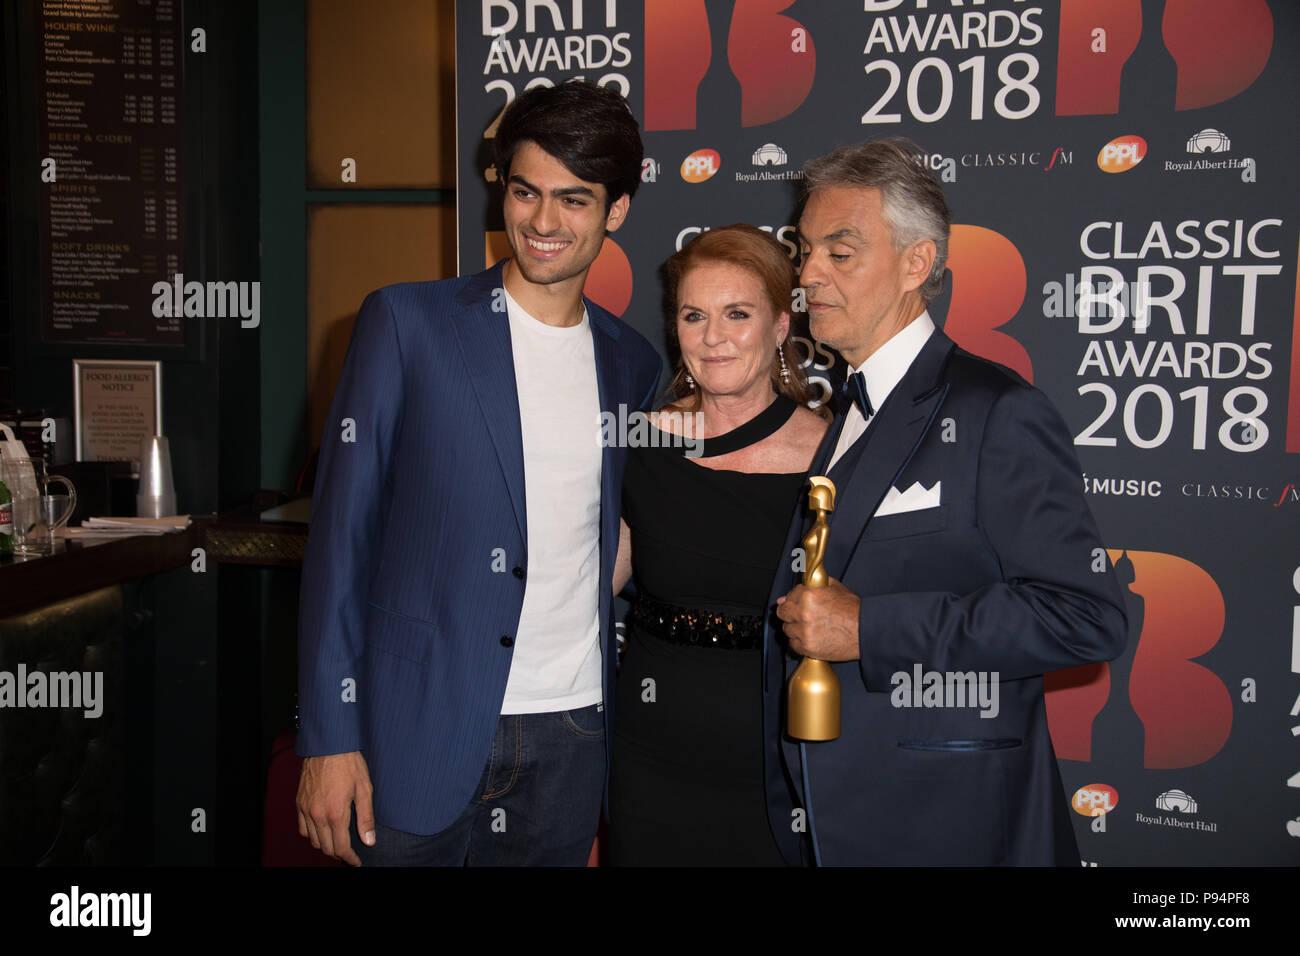 Red Carpet arrivals for the Classic Brit Awards 2018  Featuring: Matteo Bocelli, Sarah Ferguson Duchess of York, Andrea Bocelli Where: London, United Kingdom When: 13 Jun 2018 Credit: Phil Lewis/WENN.com - Stock Image